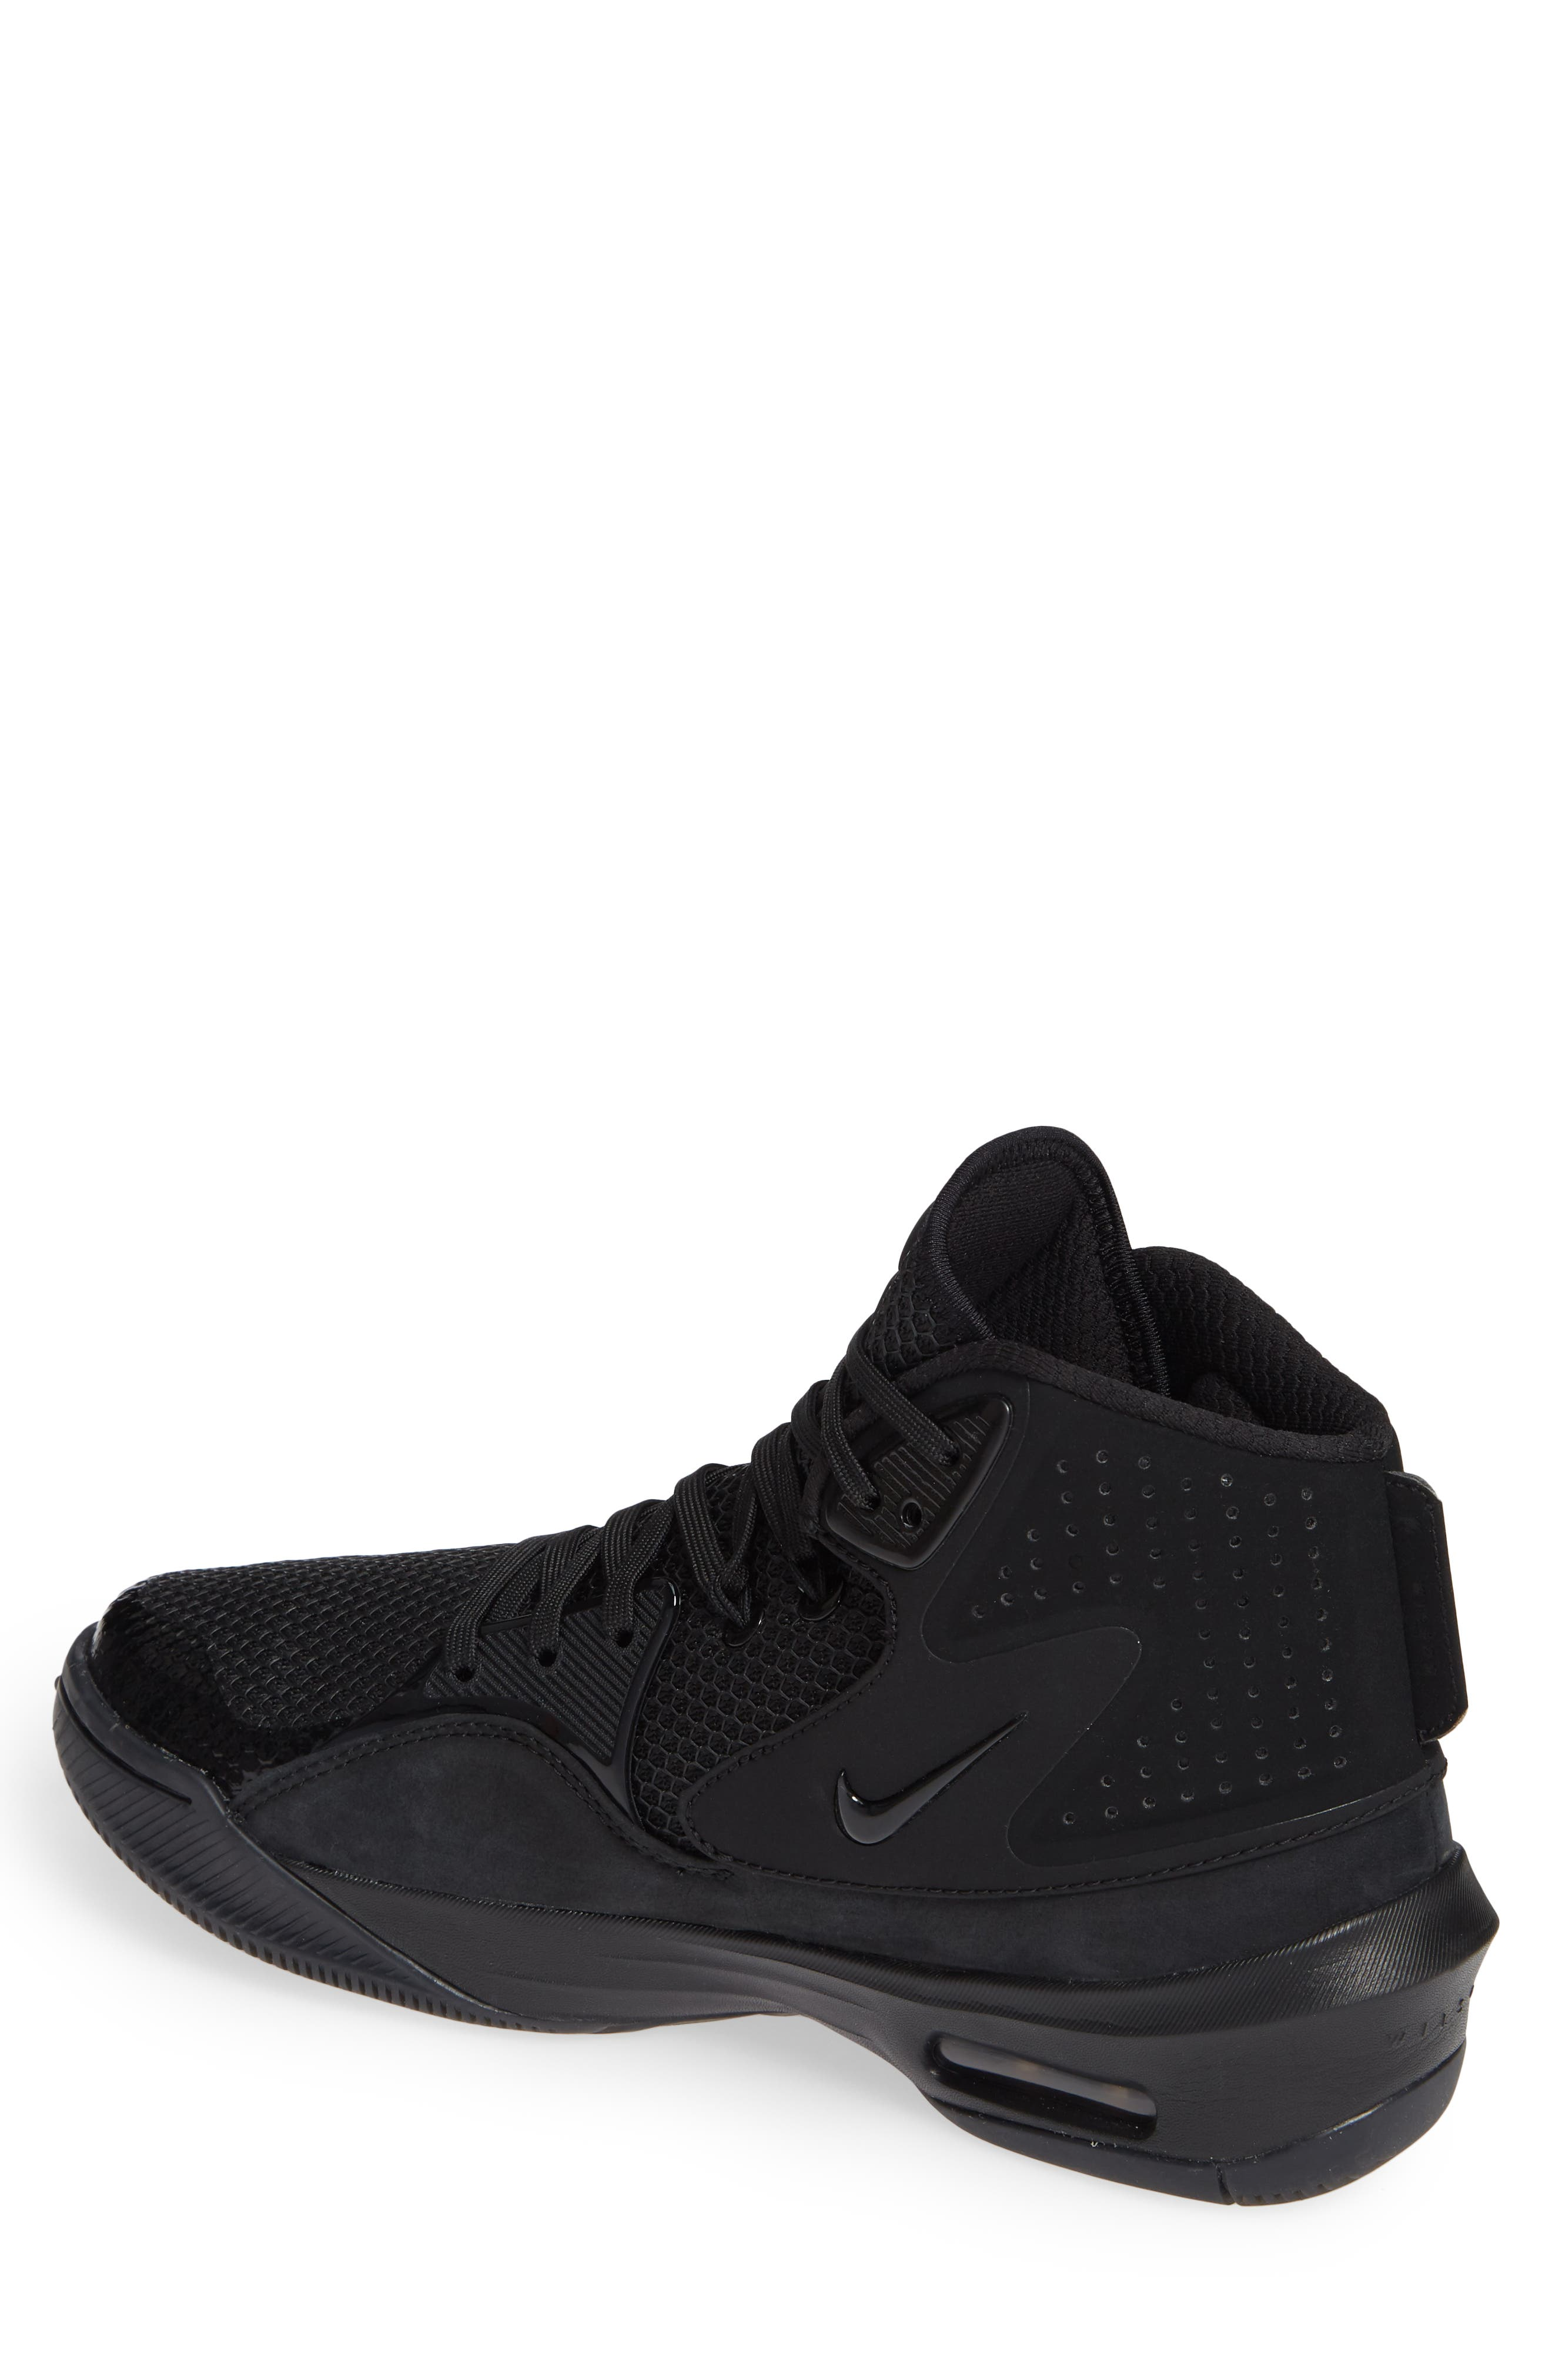 Dangeruss Wilson 1 Sneaker,                             Alternate thumbnail 2, color,                             BLACK/ METALLIC GOLD